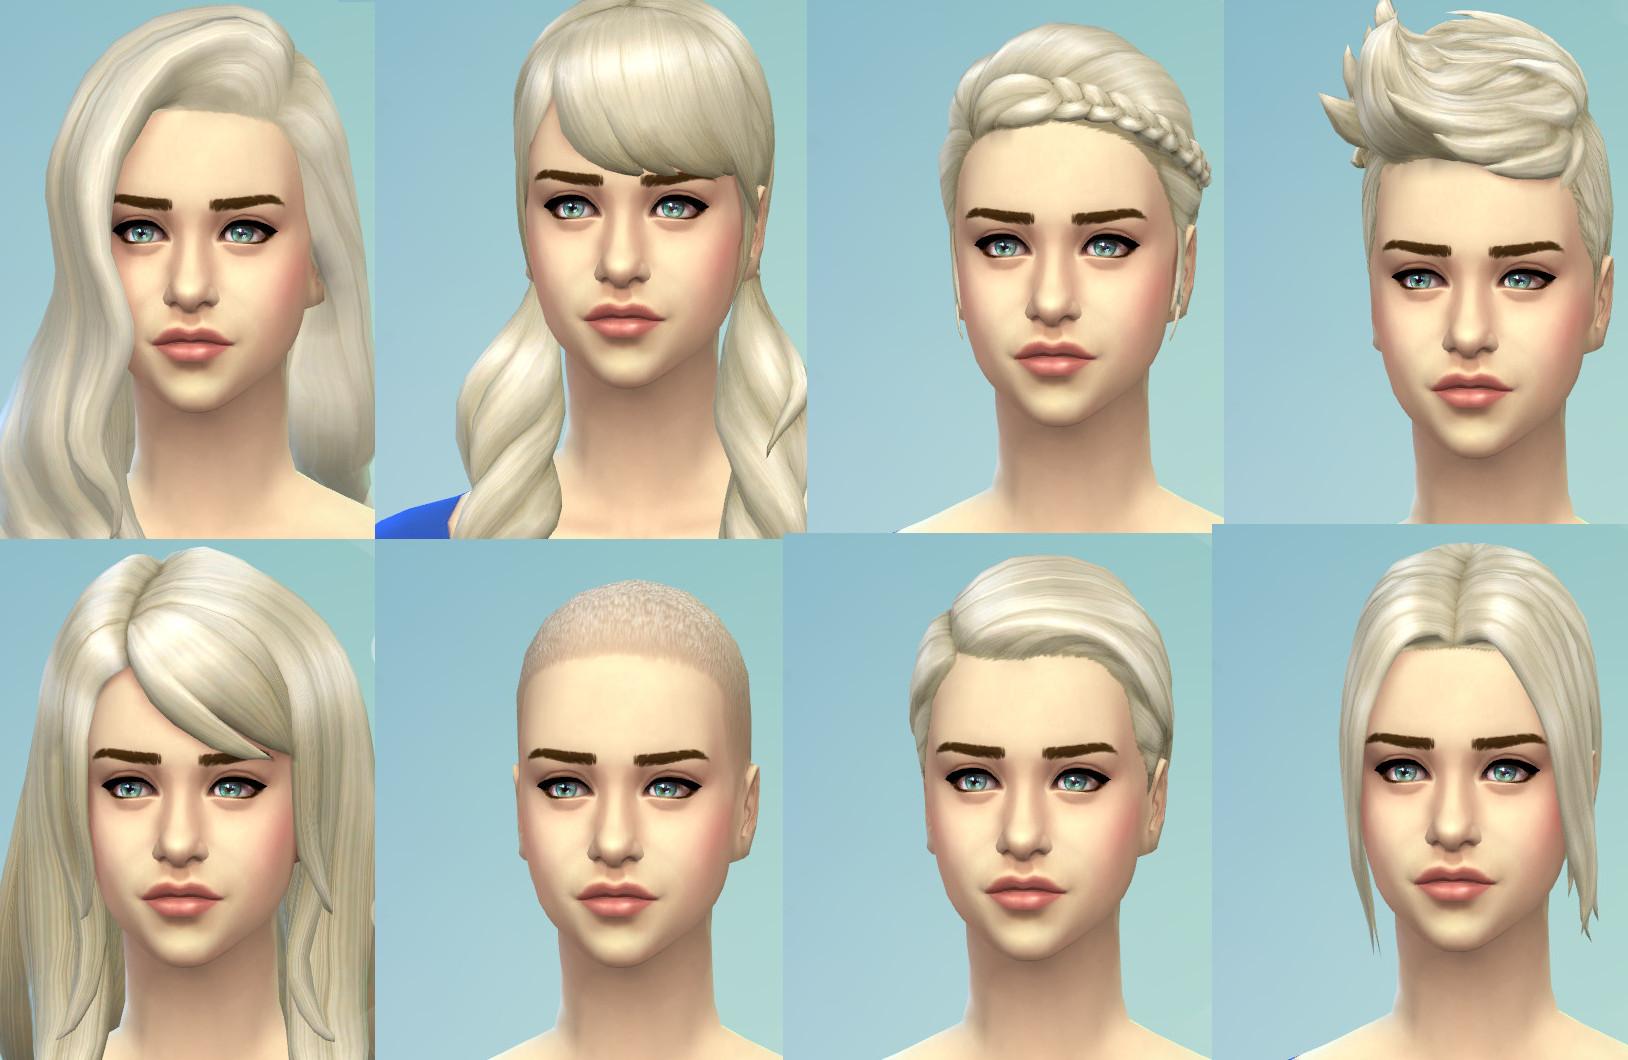 mod the sims - 'targaryen blonde' - new non-default colour for all